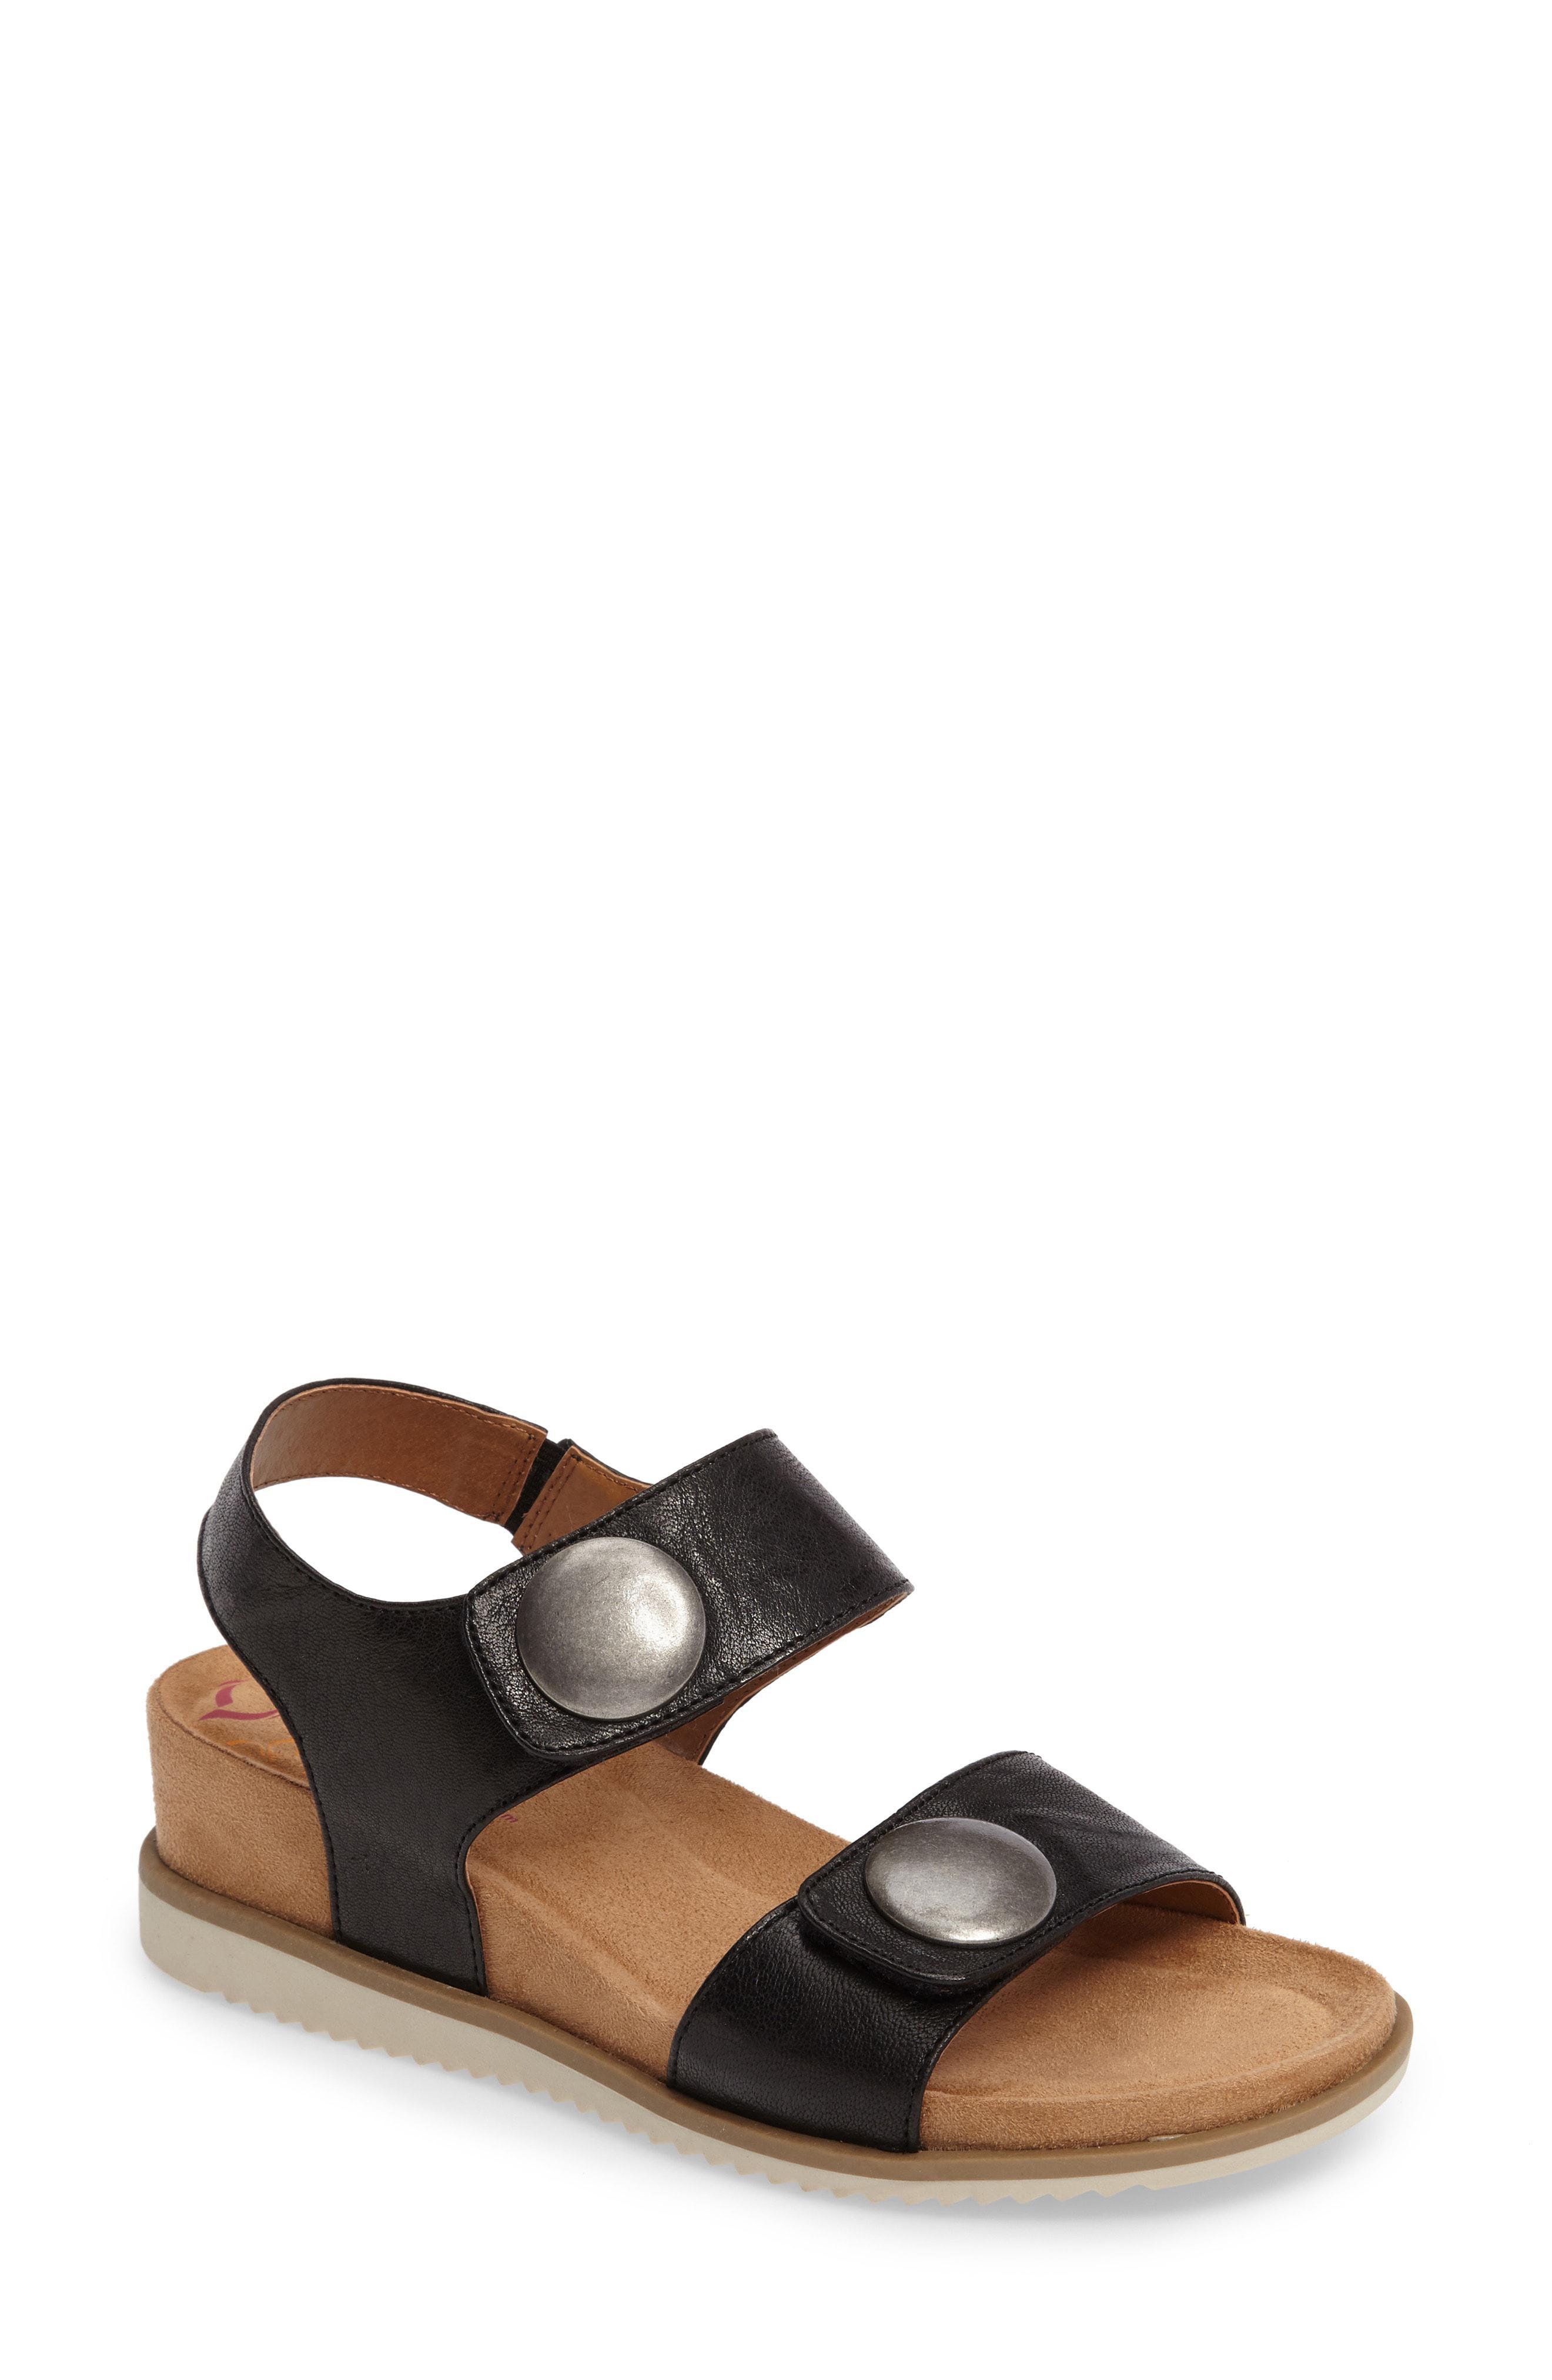 450c3cdb700 Lyst - Comfortiva Pamela Ii Sandal in Black